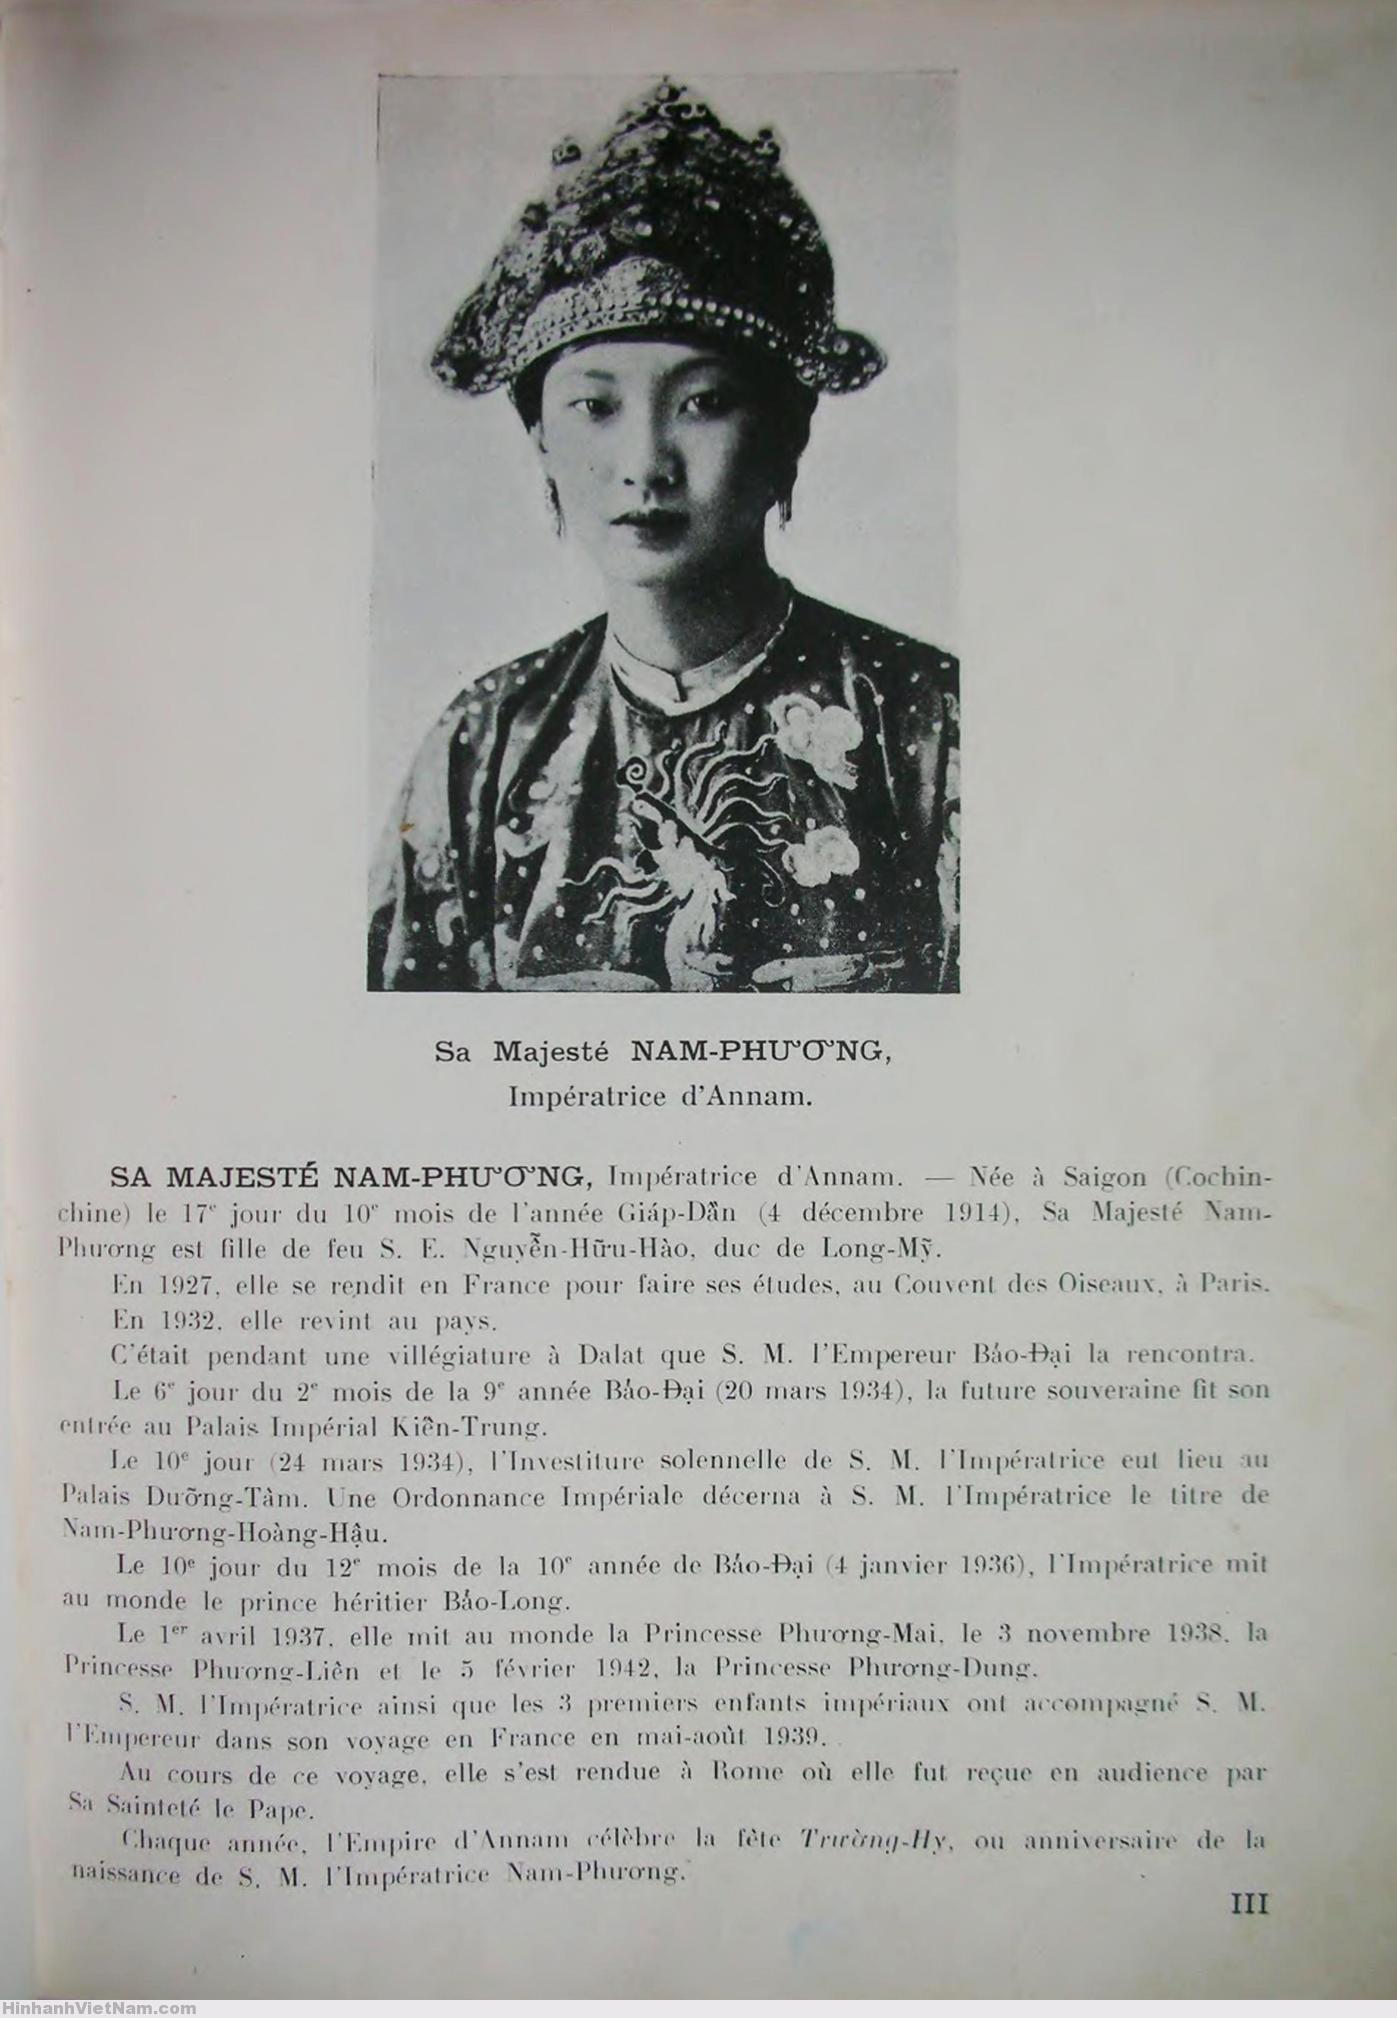 Souverains et notabilites d'Indochine (5) NAM-PHƯƠNG HOÀNG-HẬU